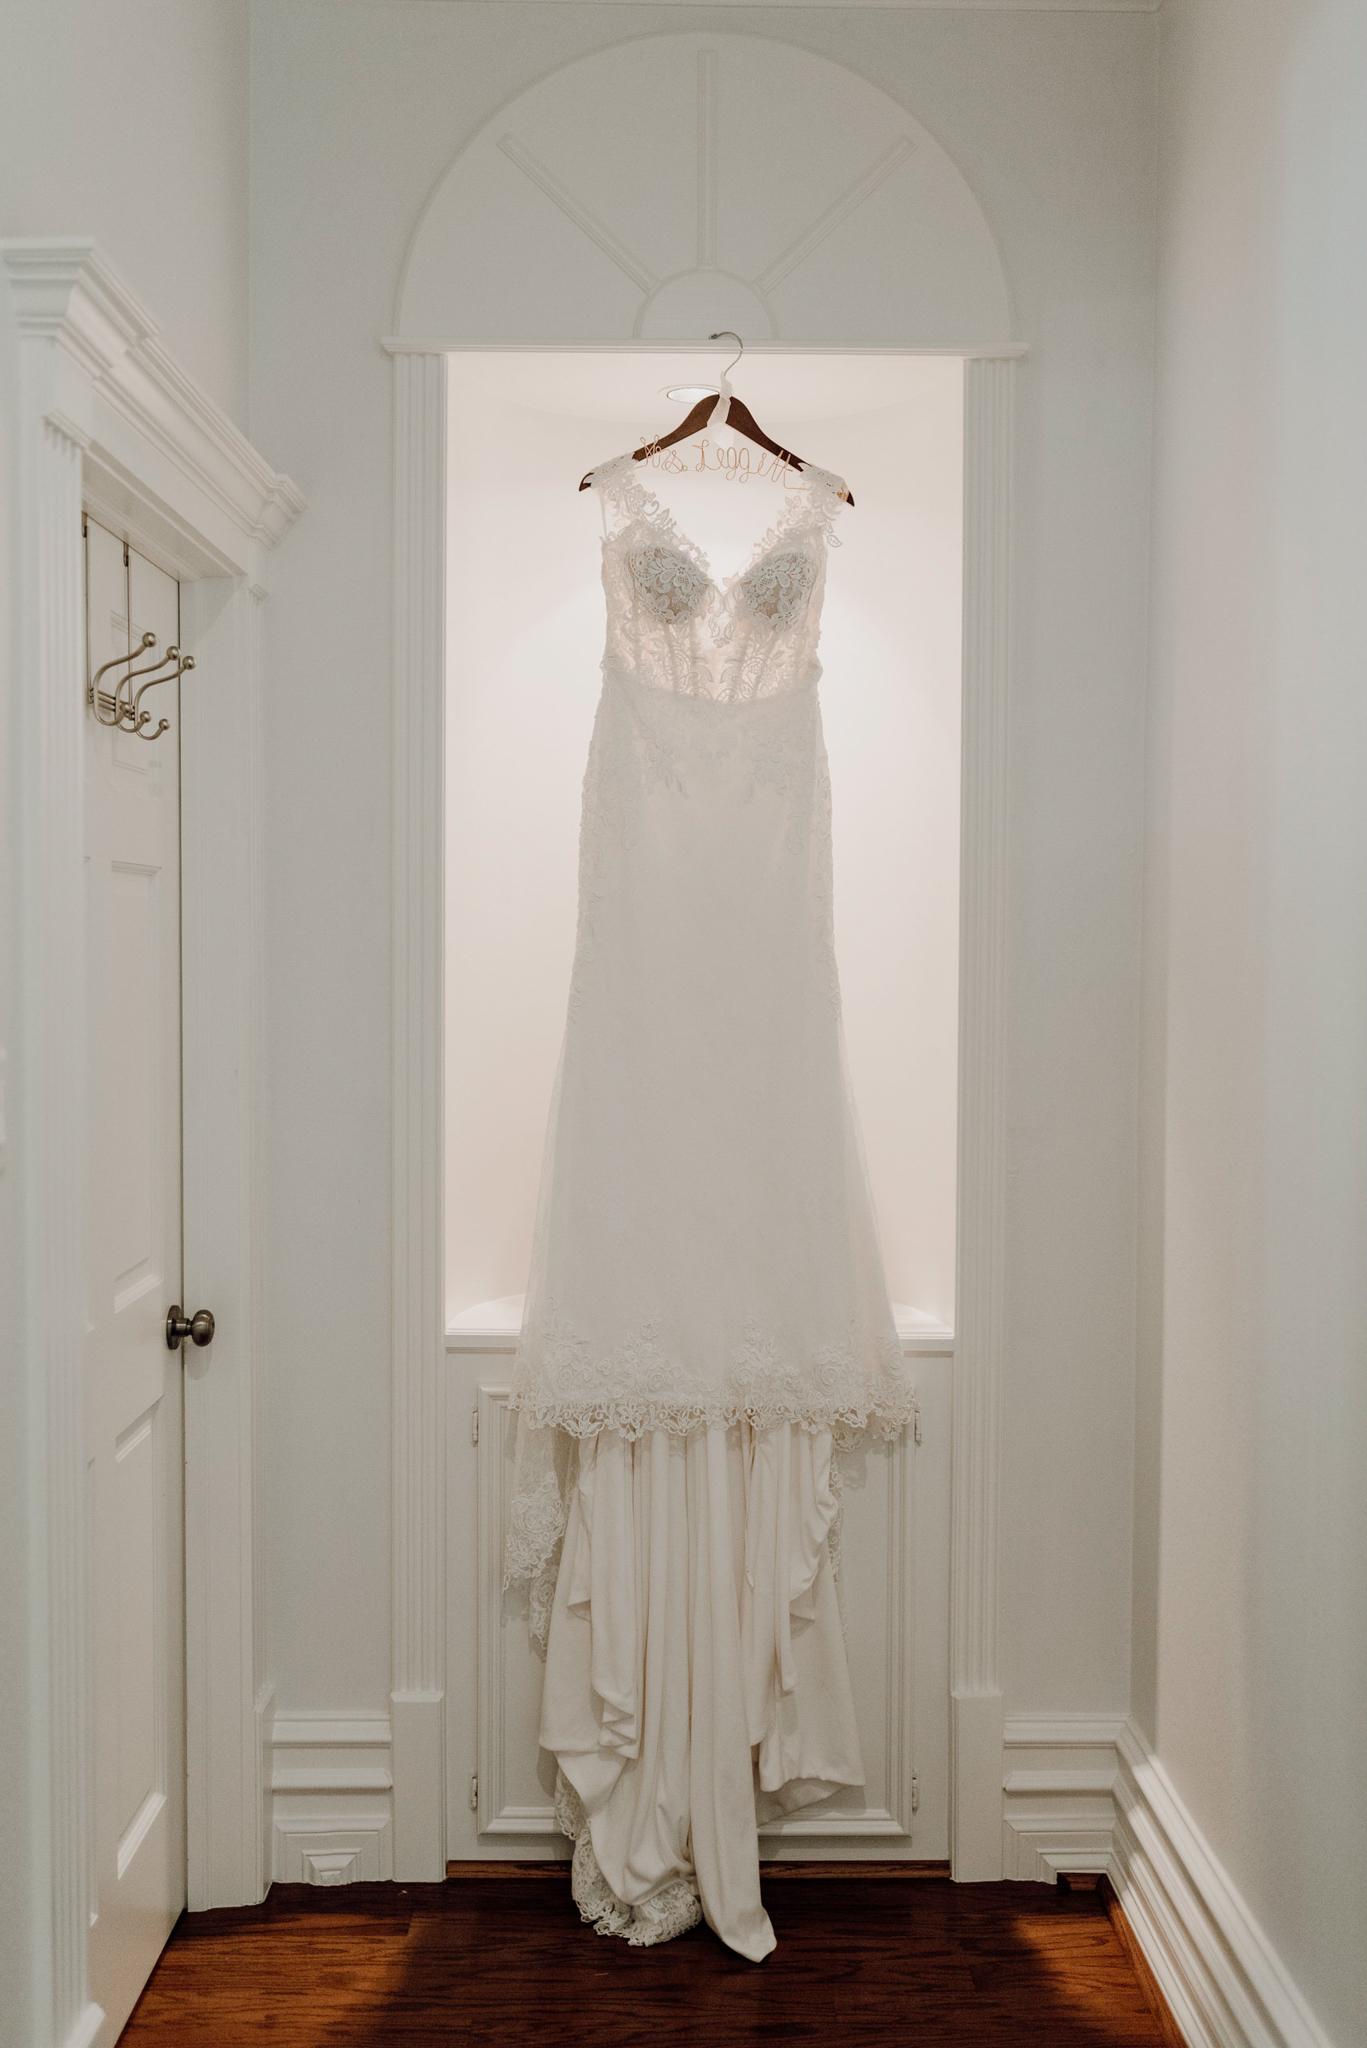 Houston Wedding Photographer-Intimate Texas Backyard Wedding- Houston Wedding Photographer -Kristen Giles Photography-5.jpg